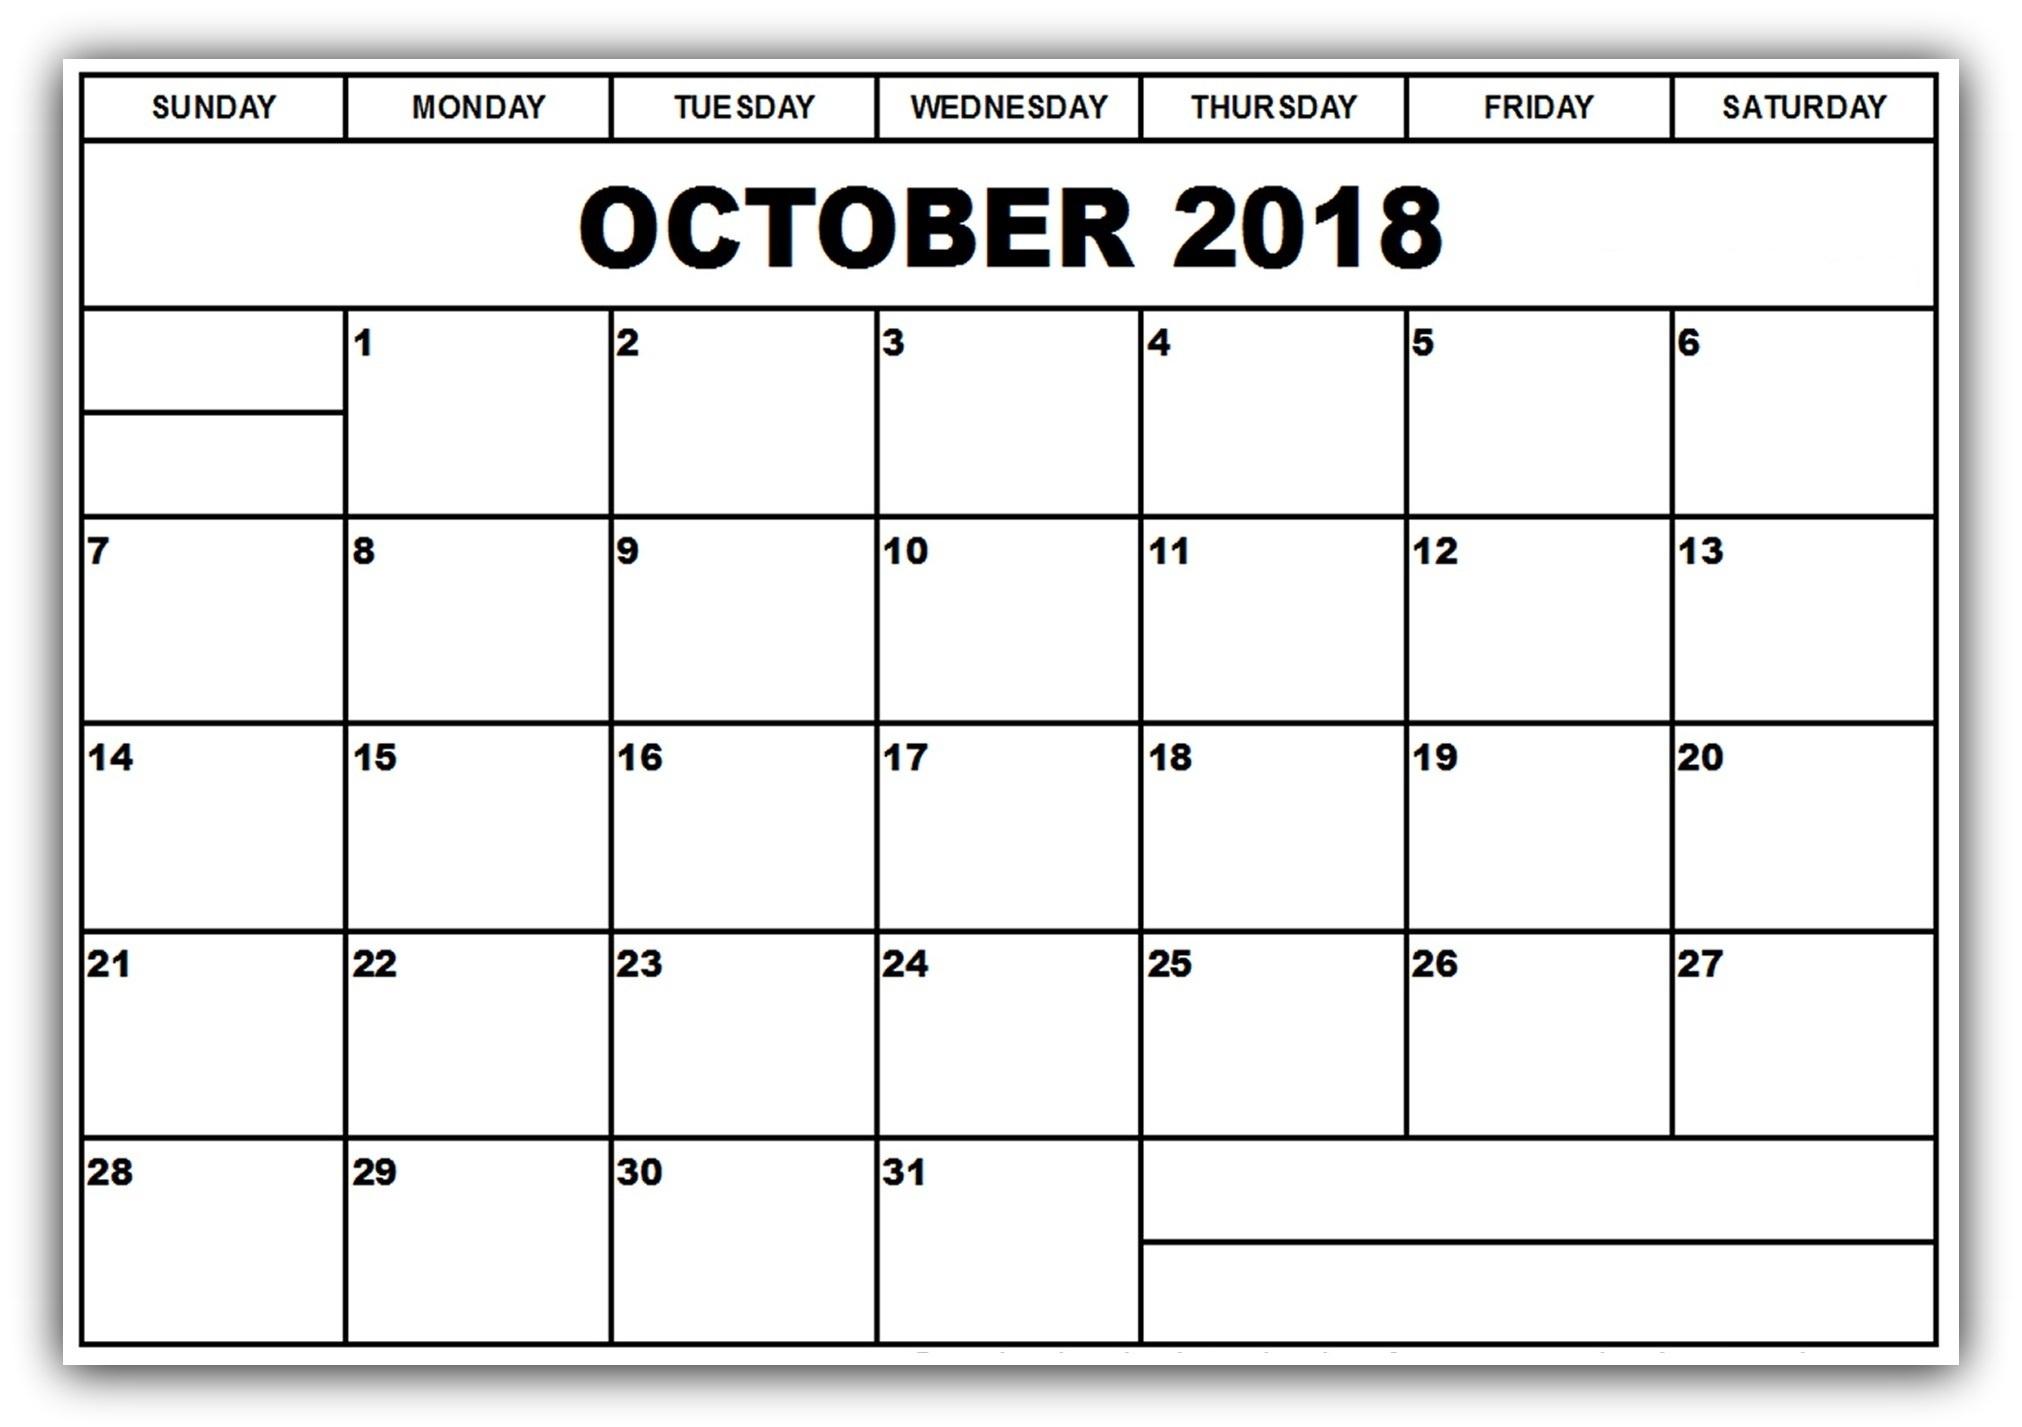 october 2018 calendar template printable printable calendar Printable October 2018 Calendar erdferdf